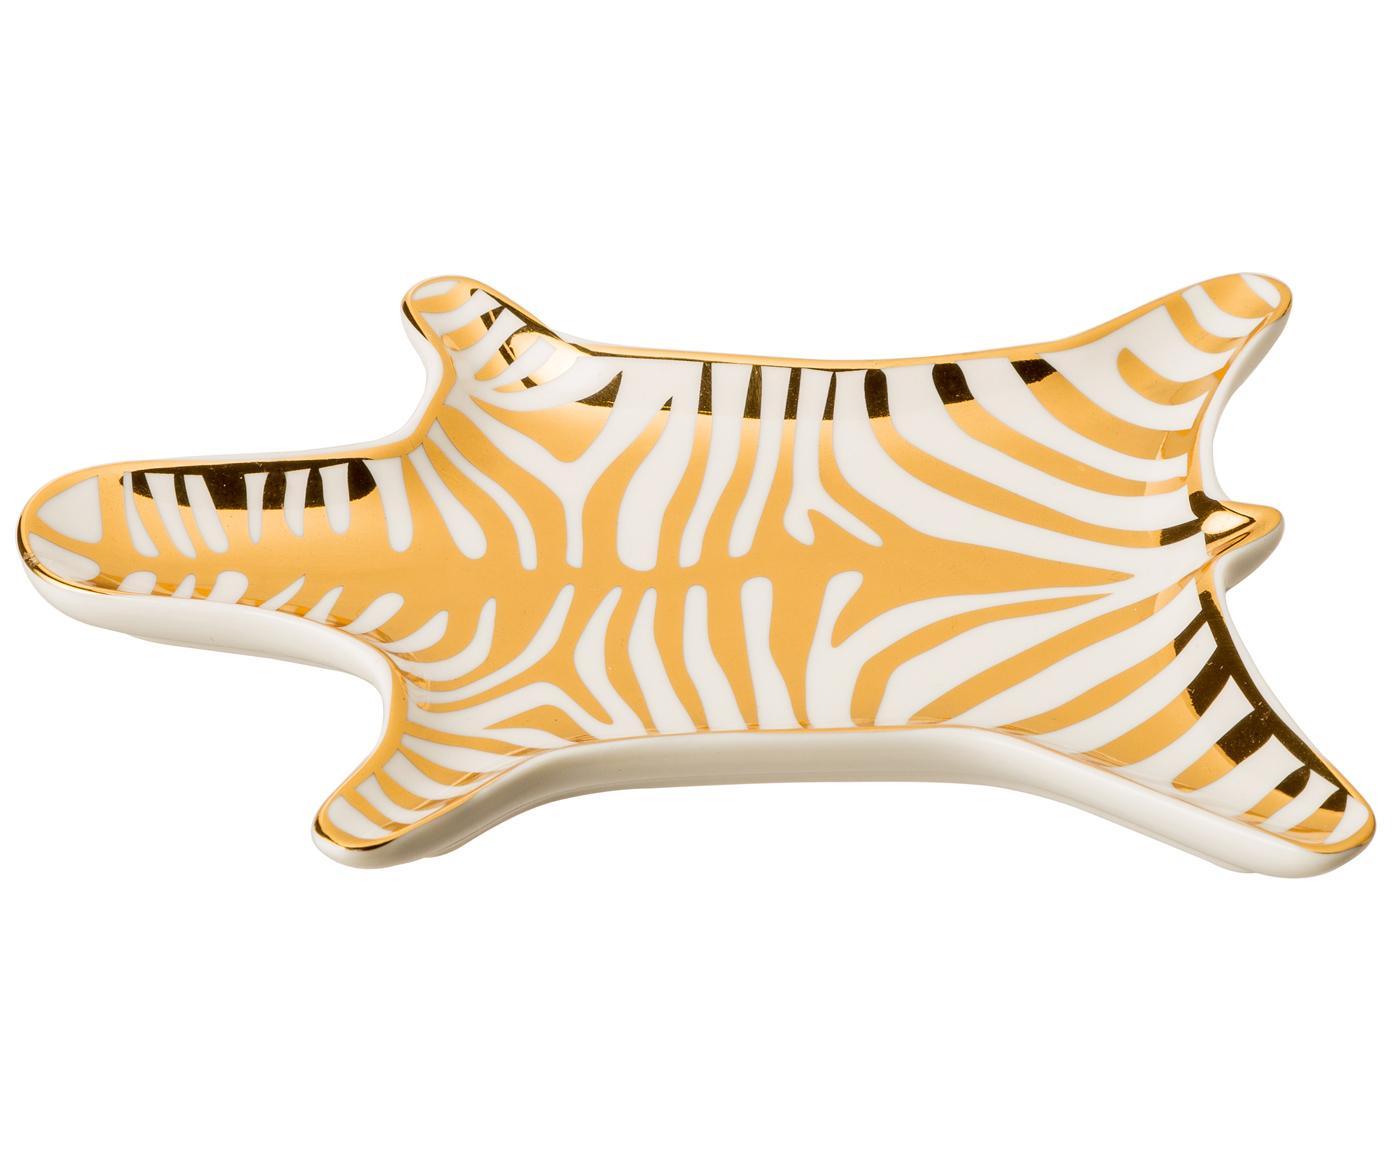 Designer-Deko-Schale Zebra aus Porzellan, Porzellan, Goldfarben, Weiss, B 15 x T 11 cm